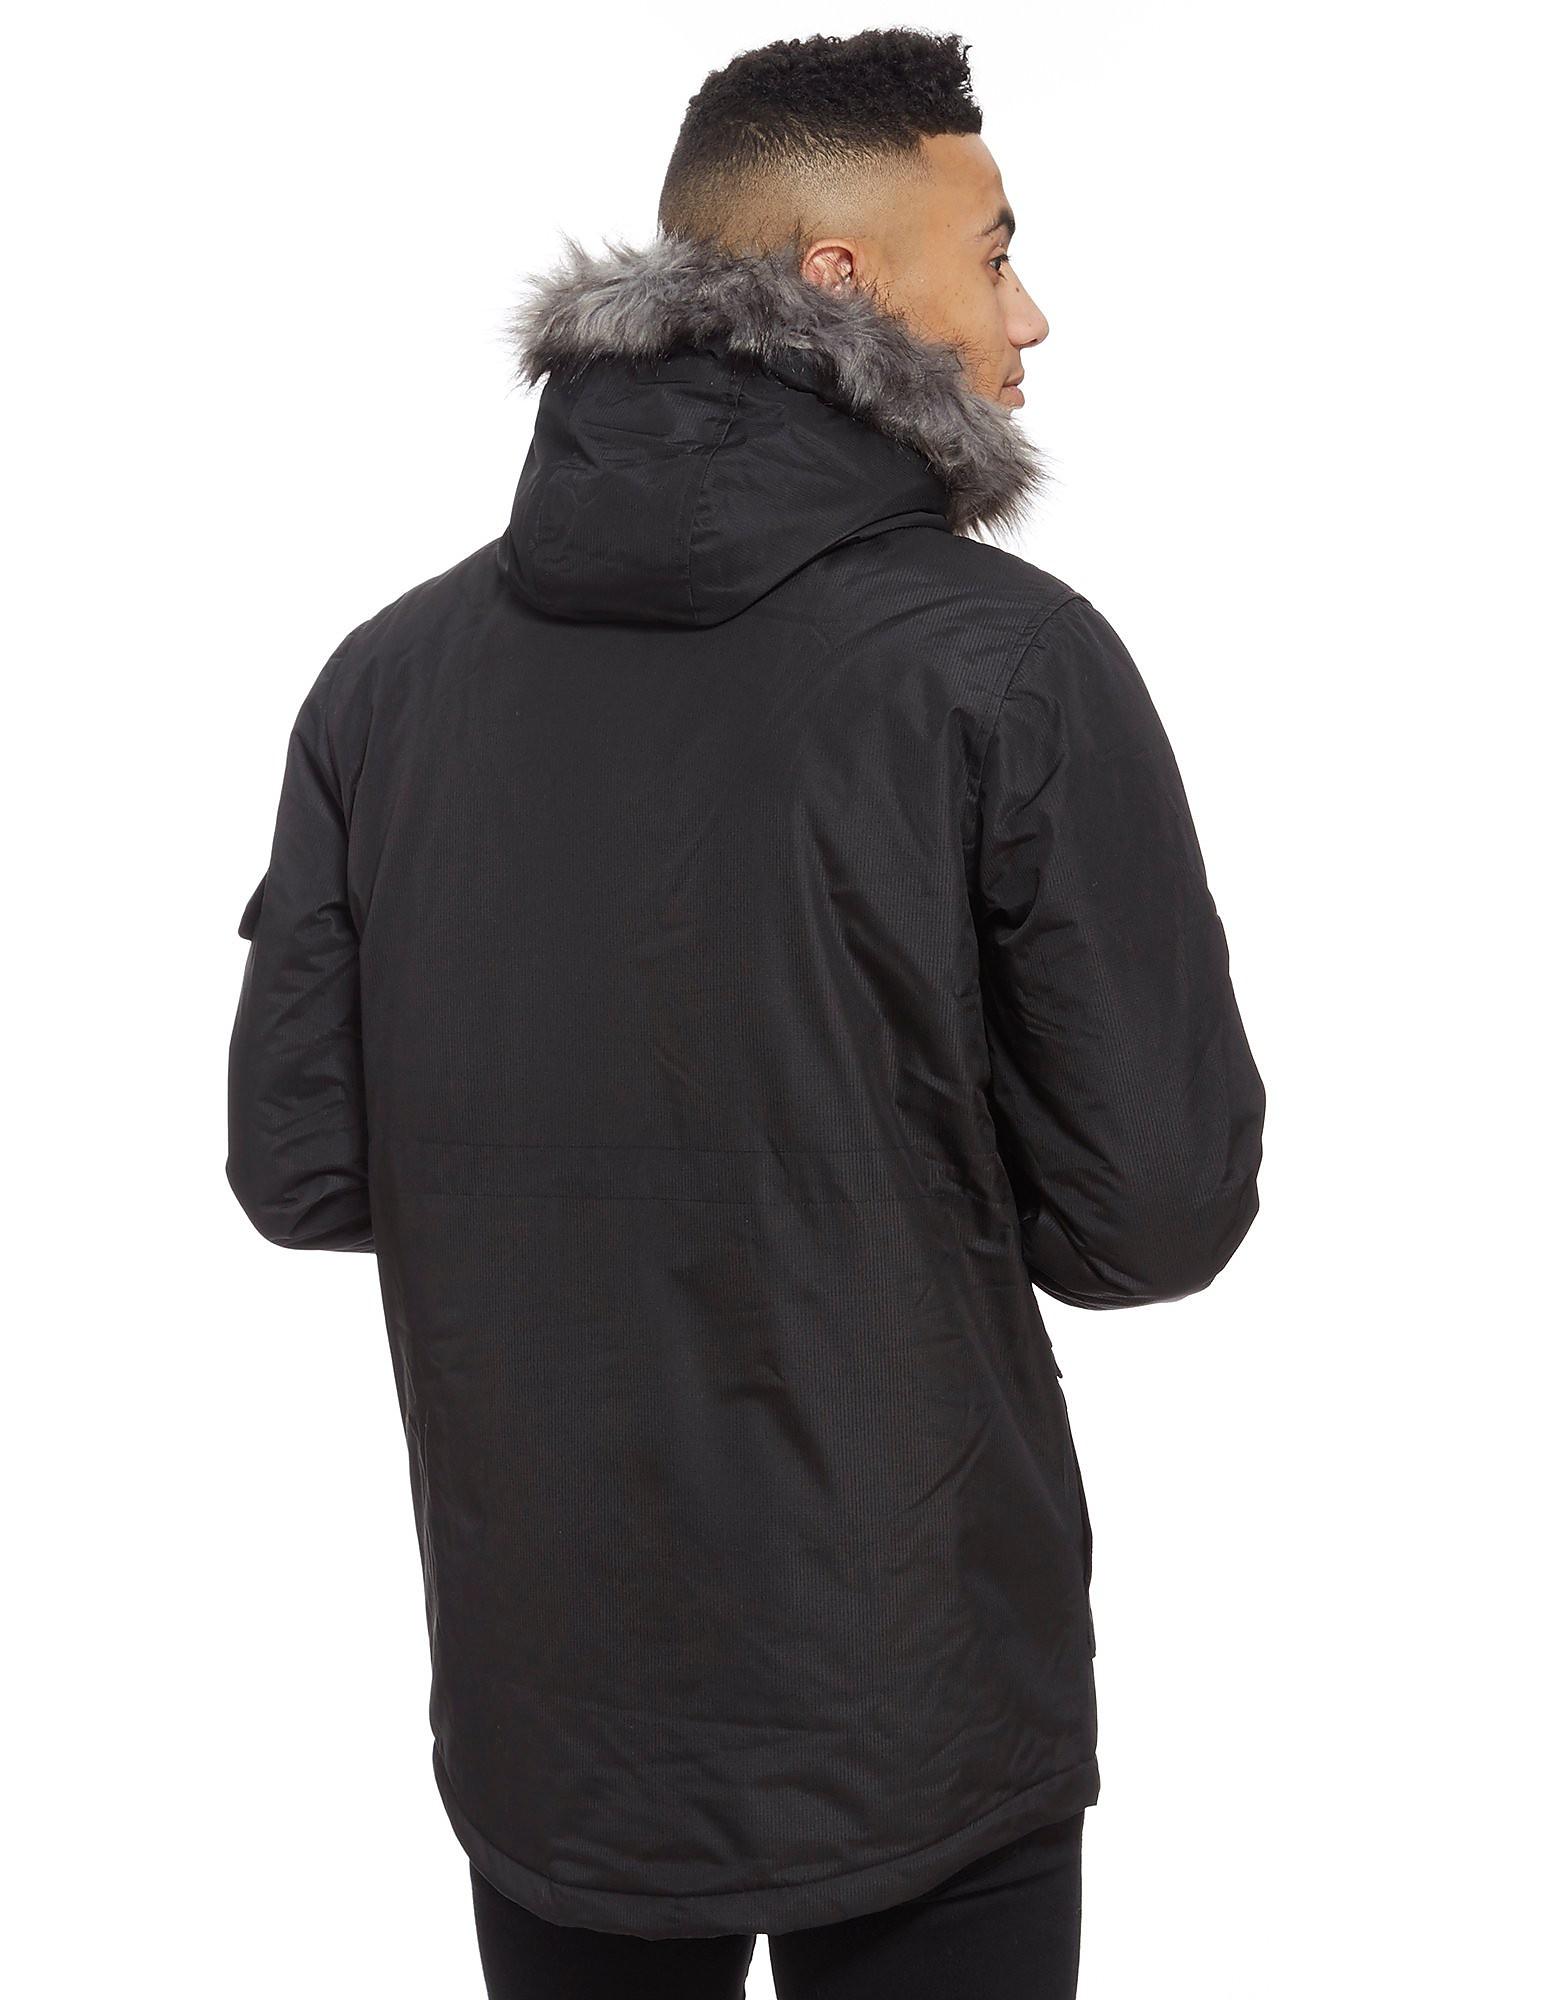 Supply & Demand Zeus Parka Jacket